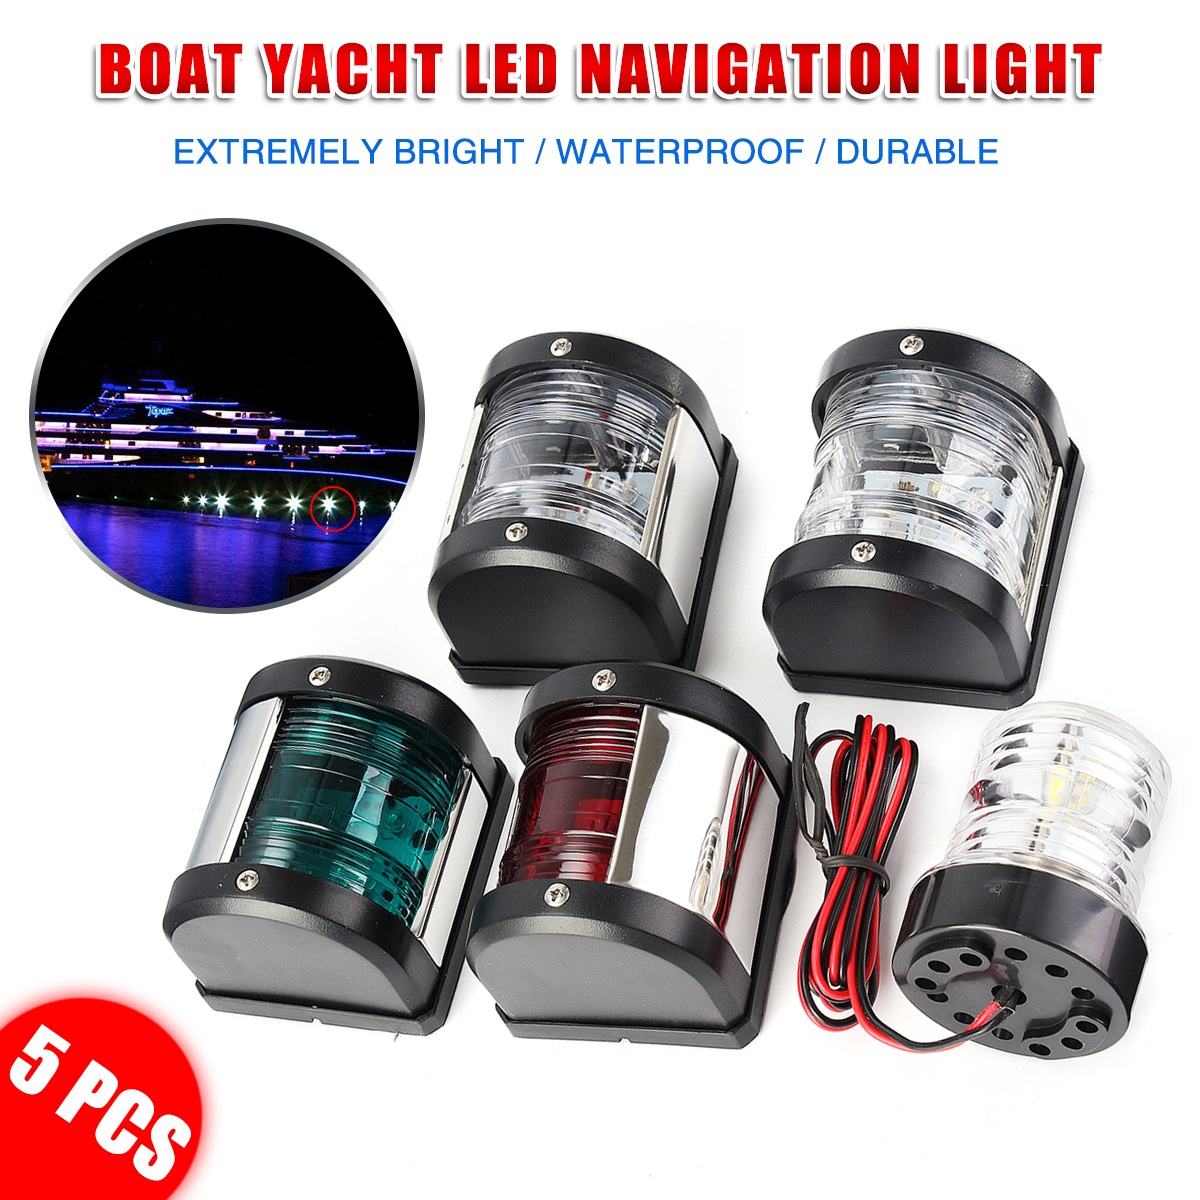 Marine Boat Yacht S.S 12V LED Red All Round 360 Degree Navigation Light